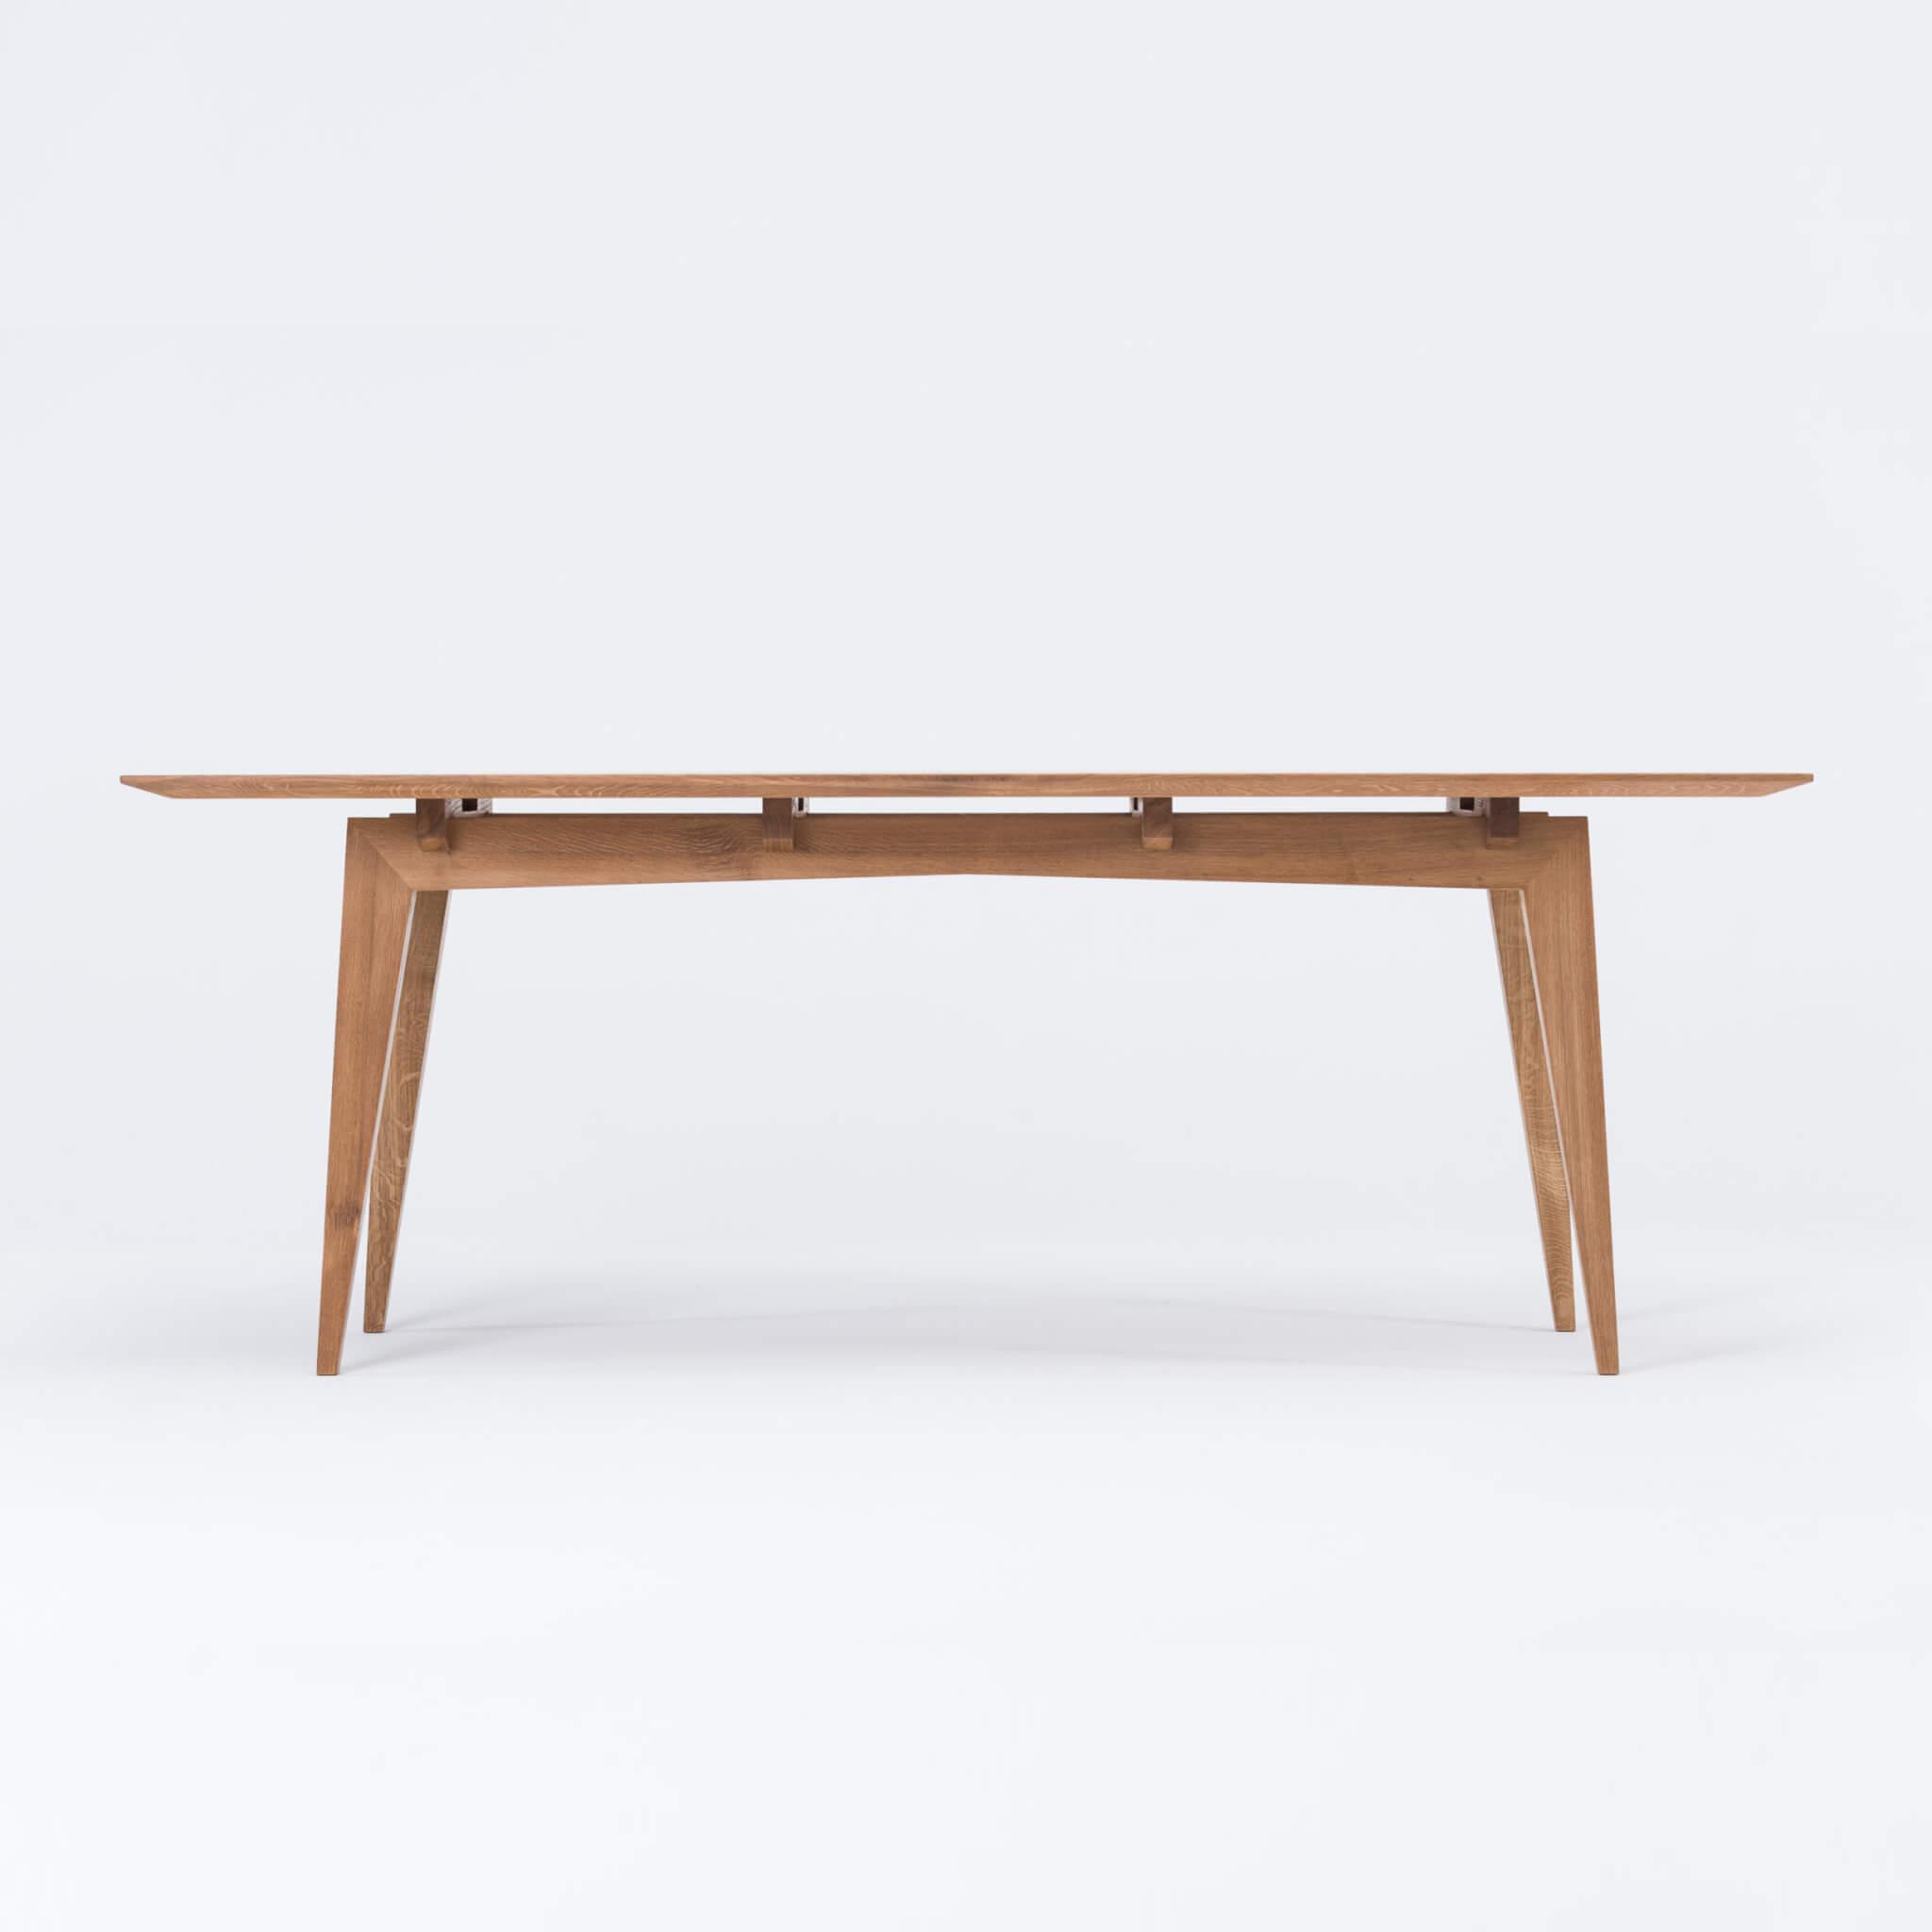 tamaza-stol-table-oak-debowy-stfurniture.com-sq